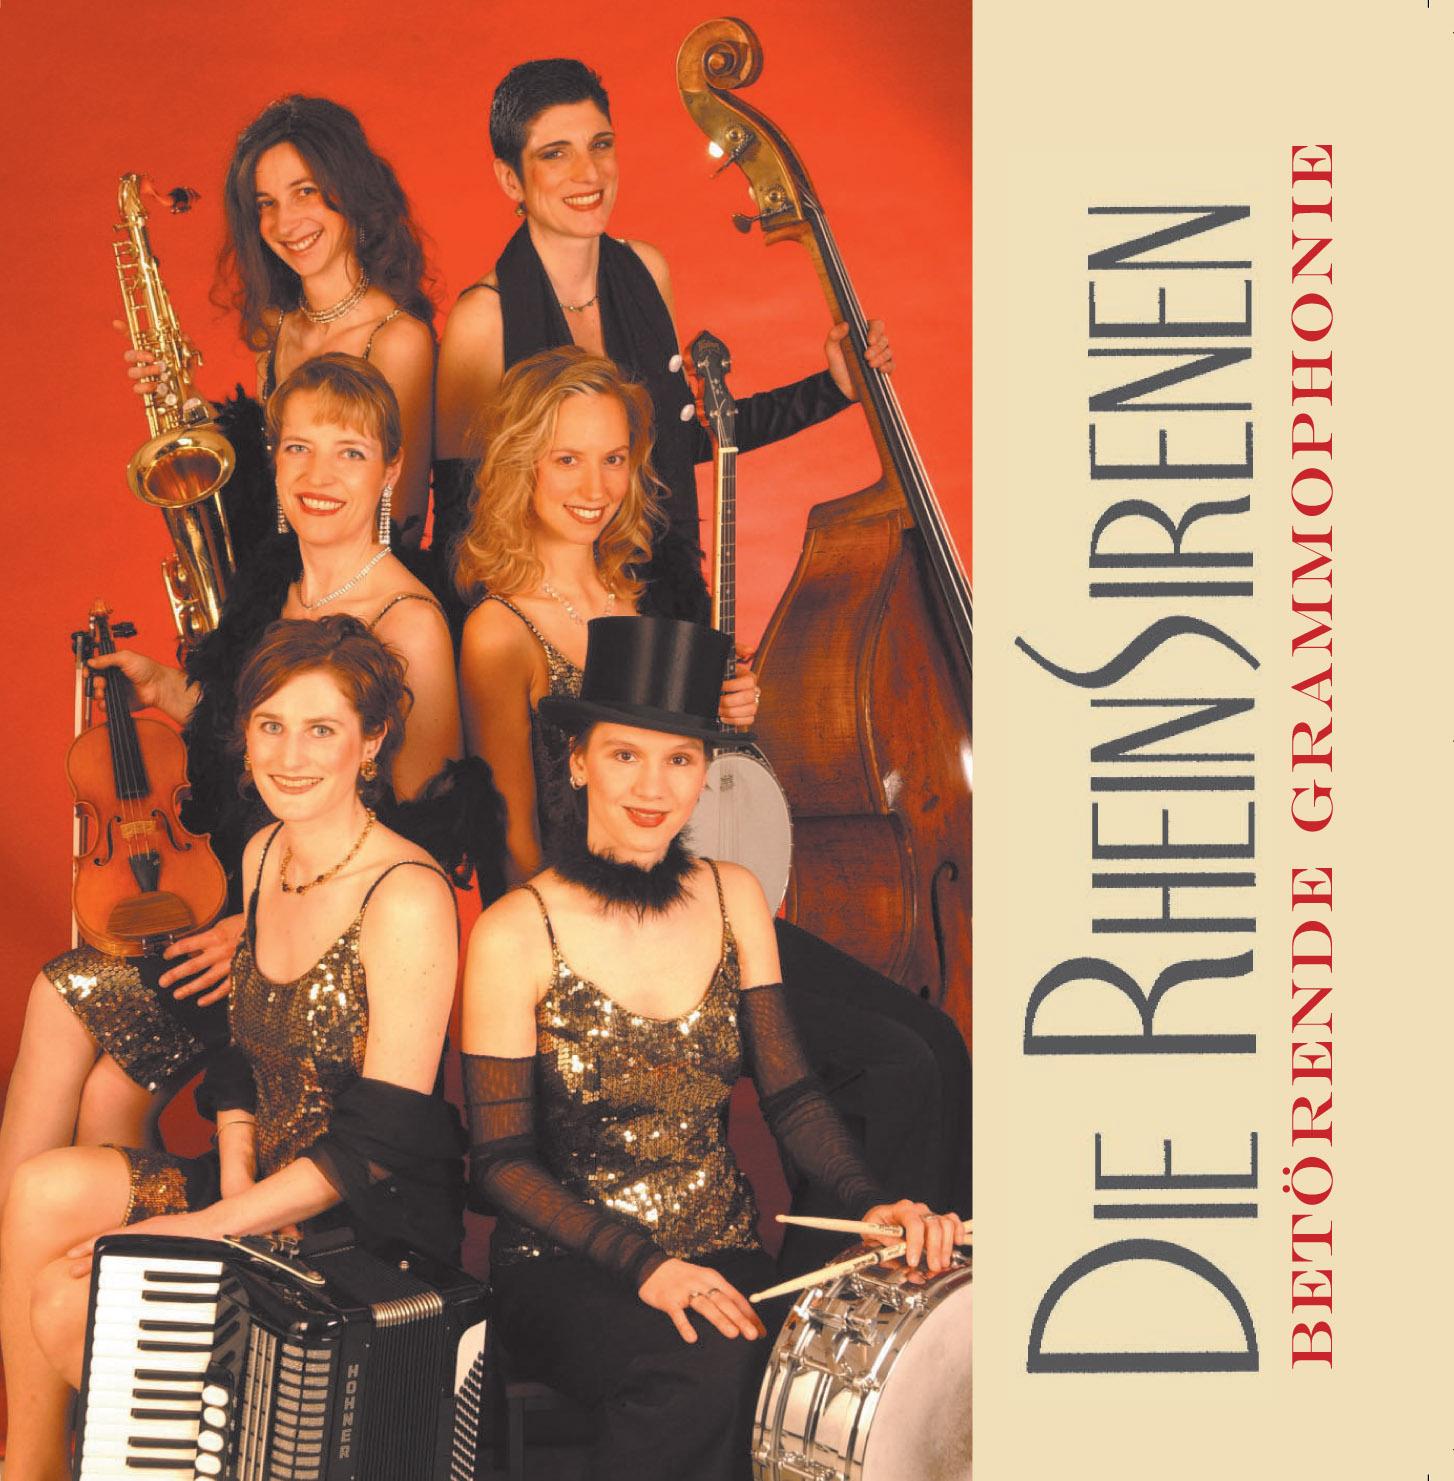 CD-Cover Die Rheinsirenen Betörende Grammophonie